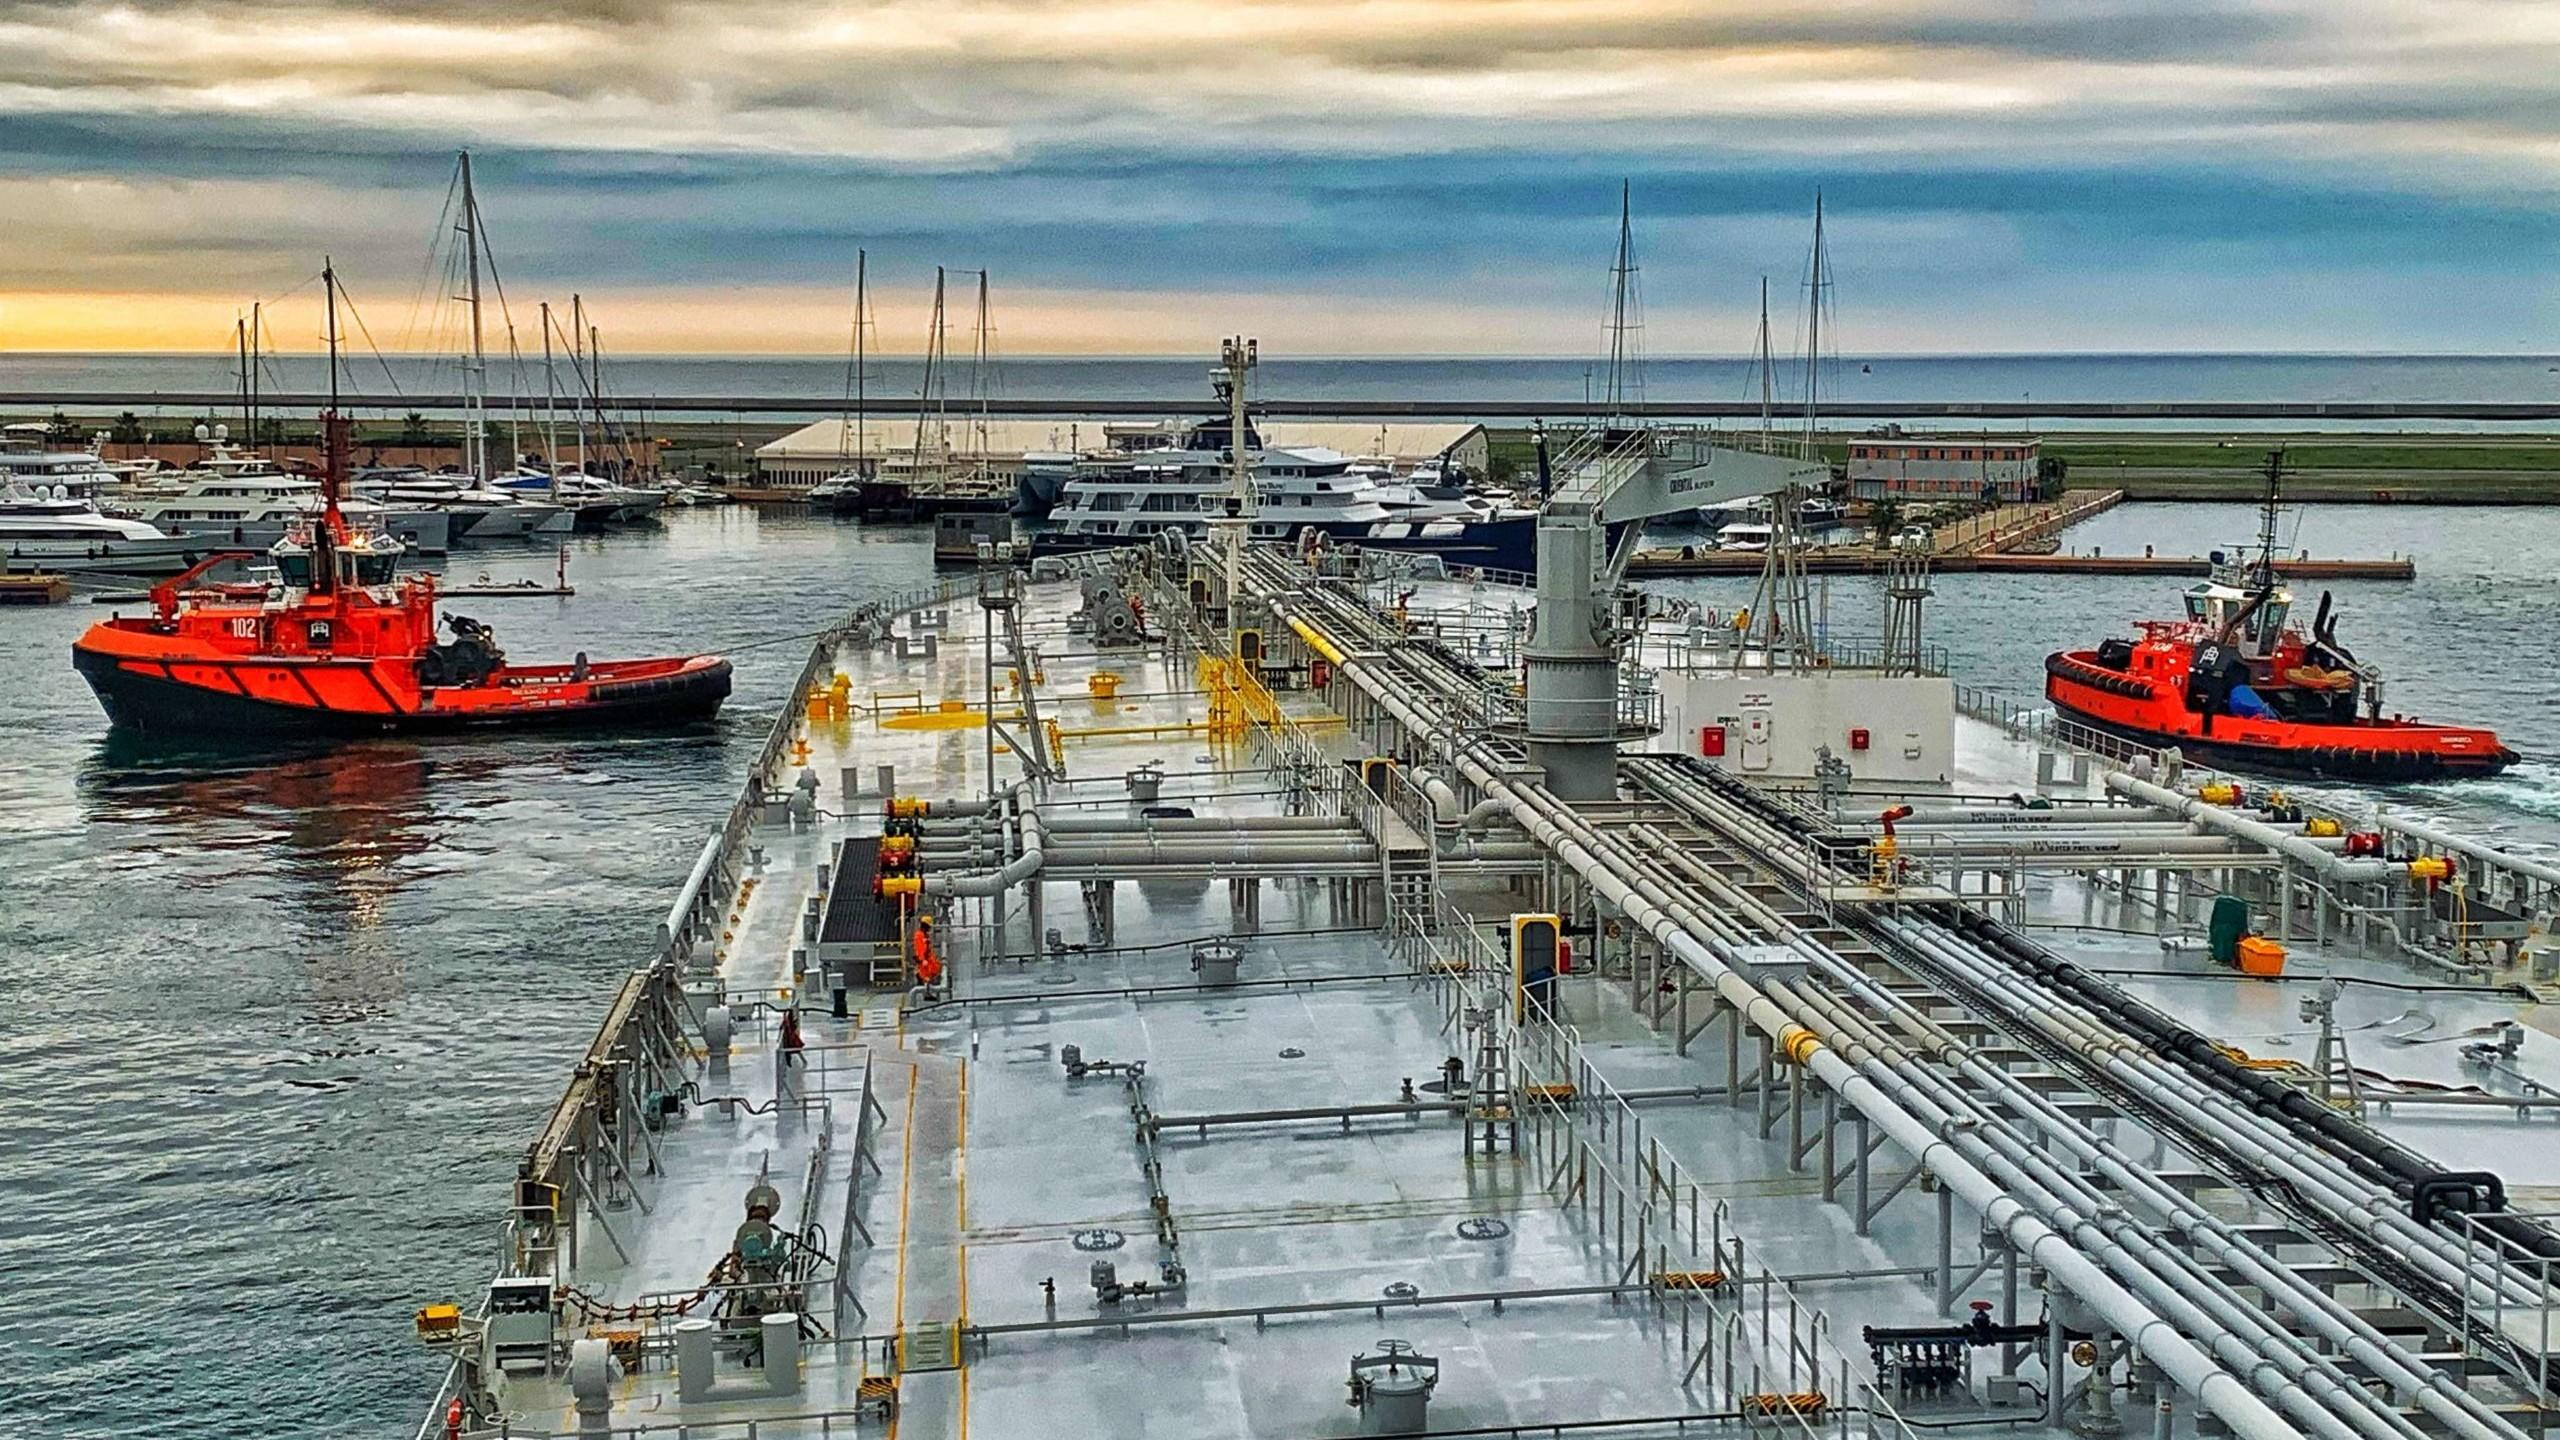 Petroliera in manovra